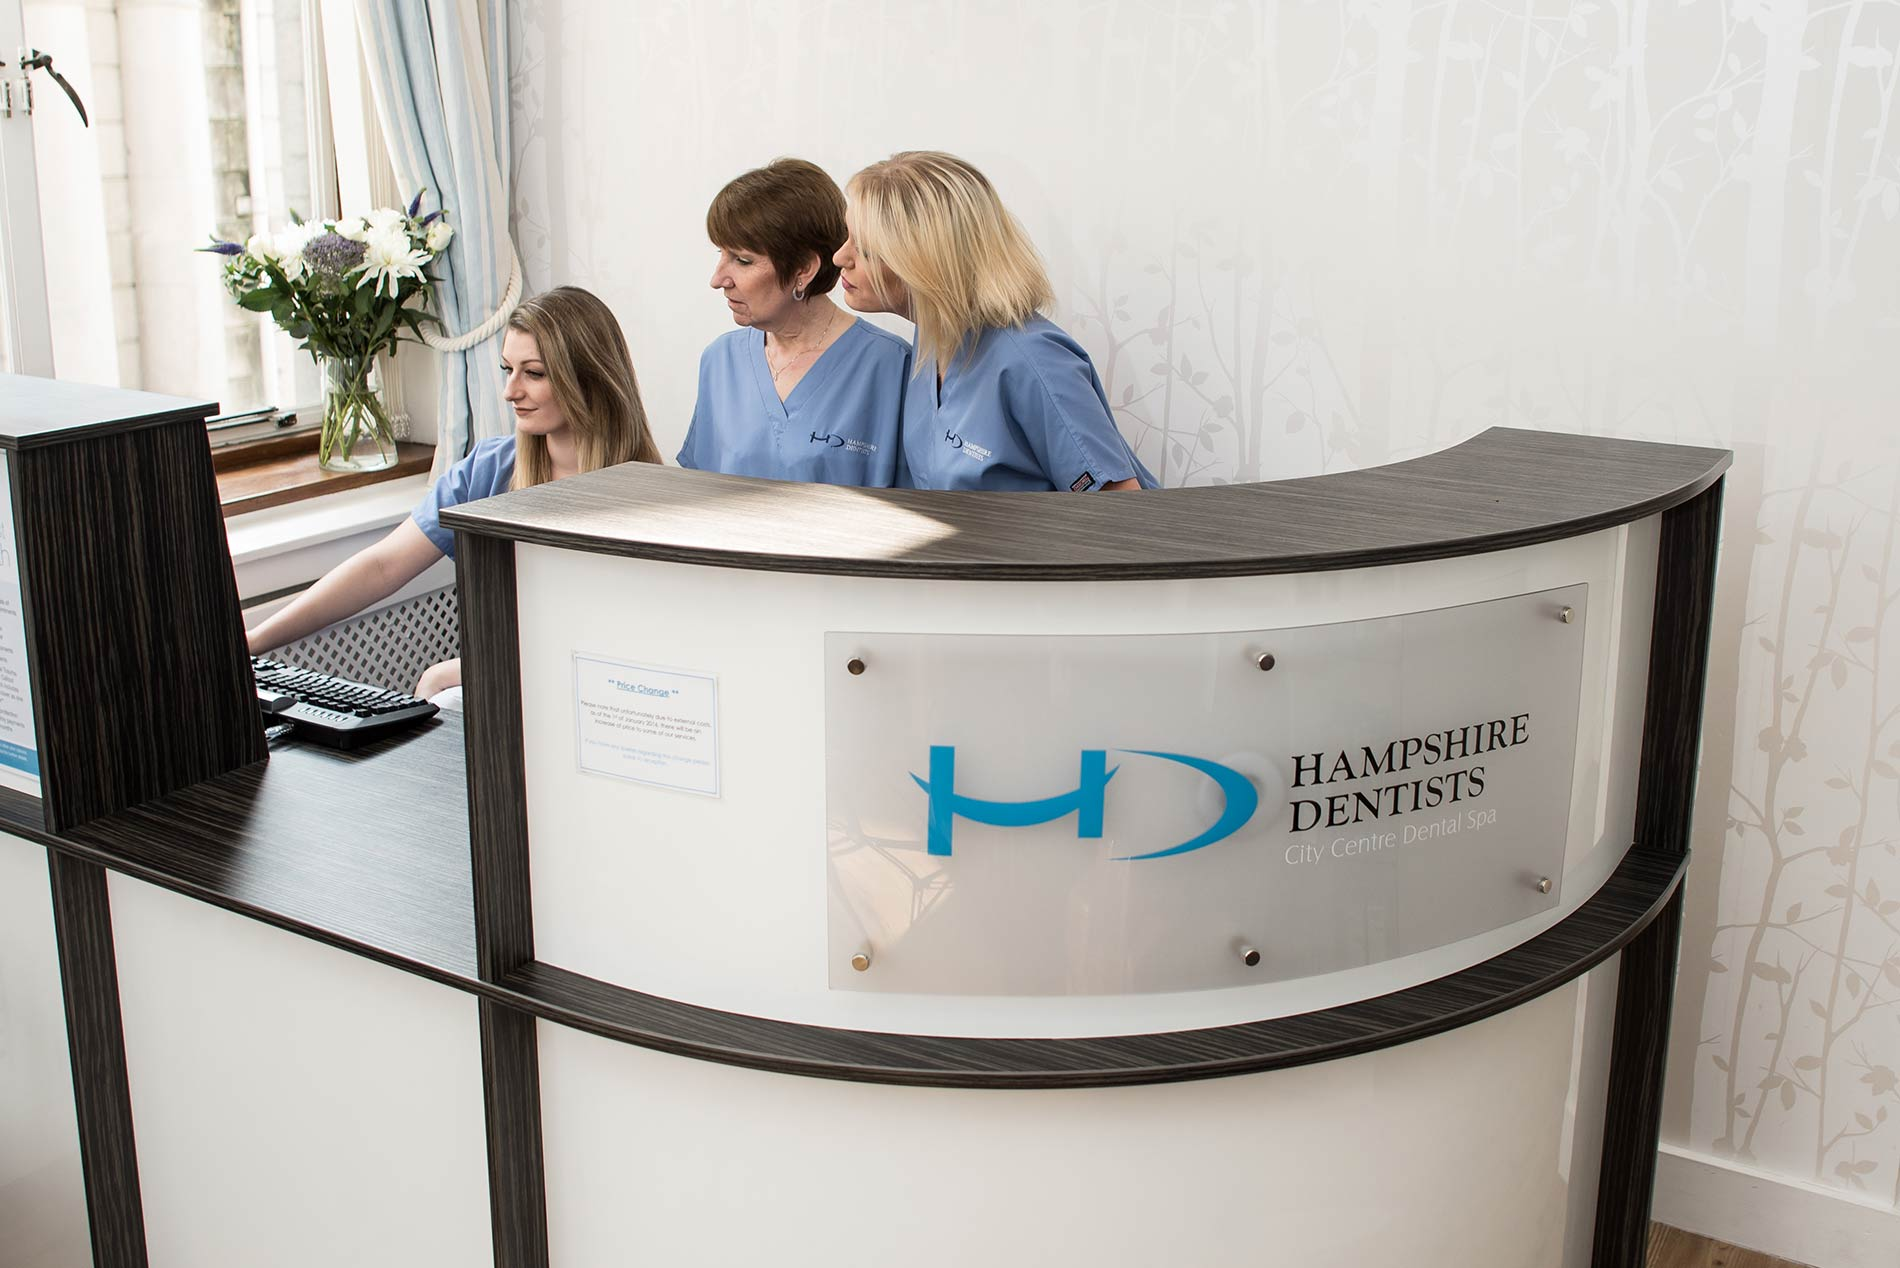 Hampshire Dentists Surgery